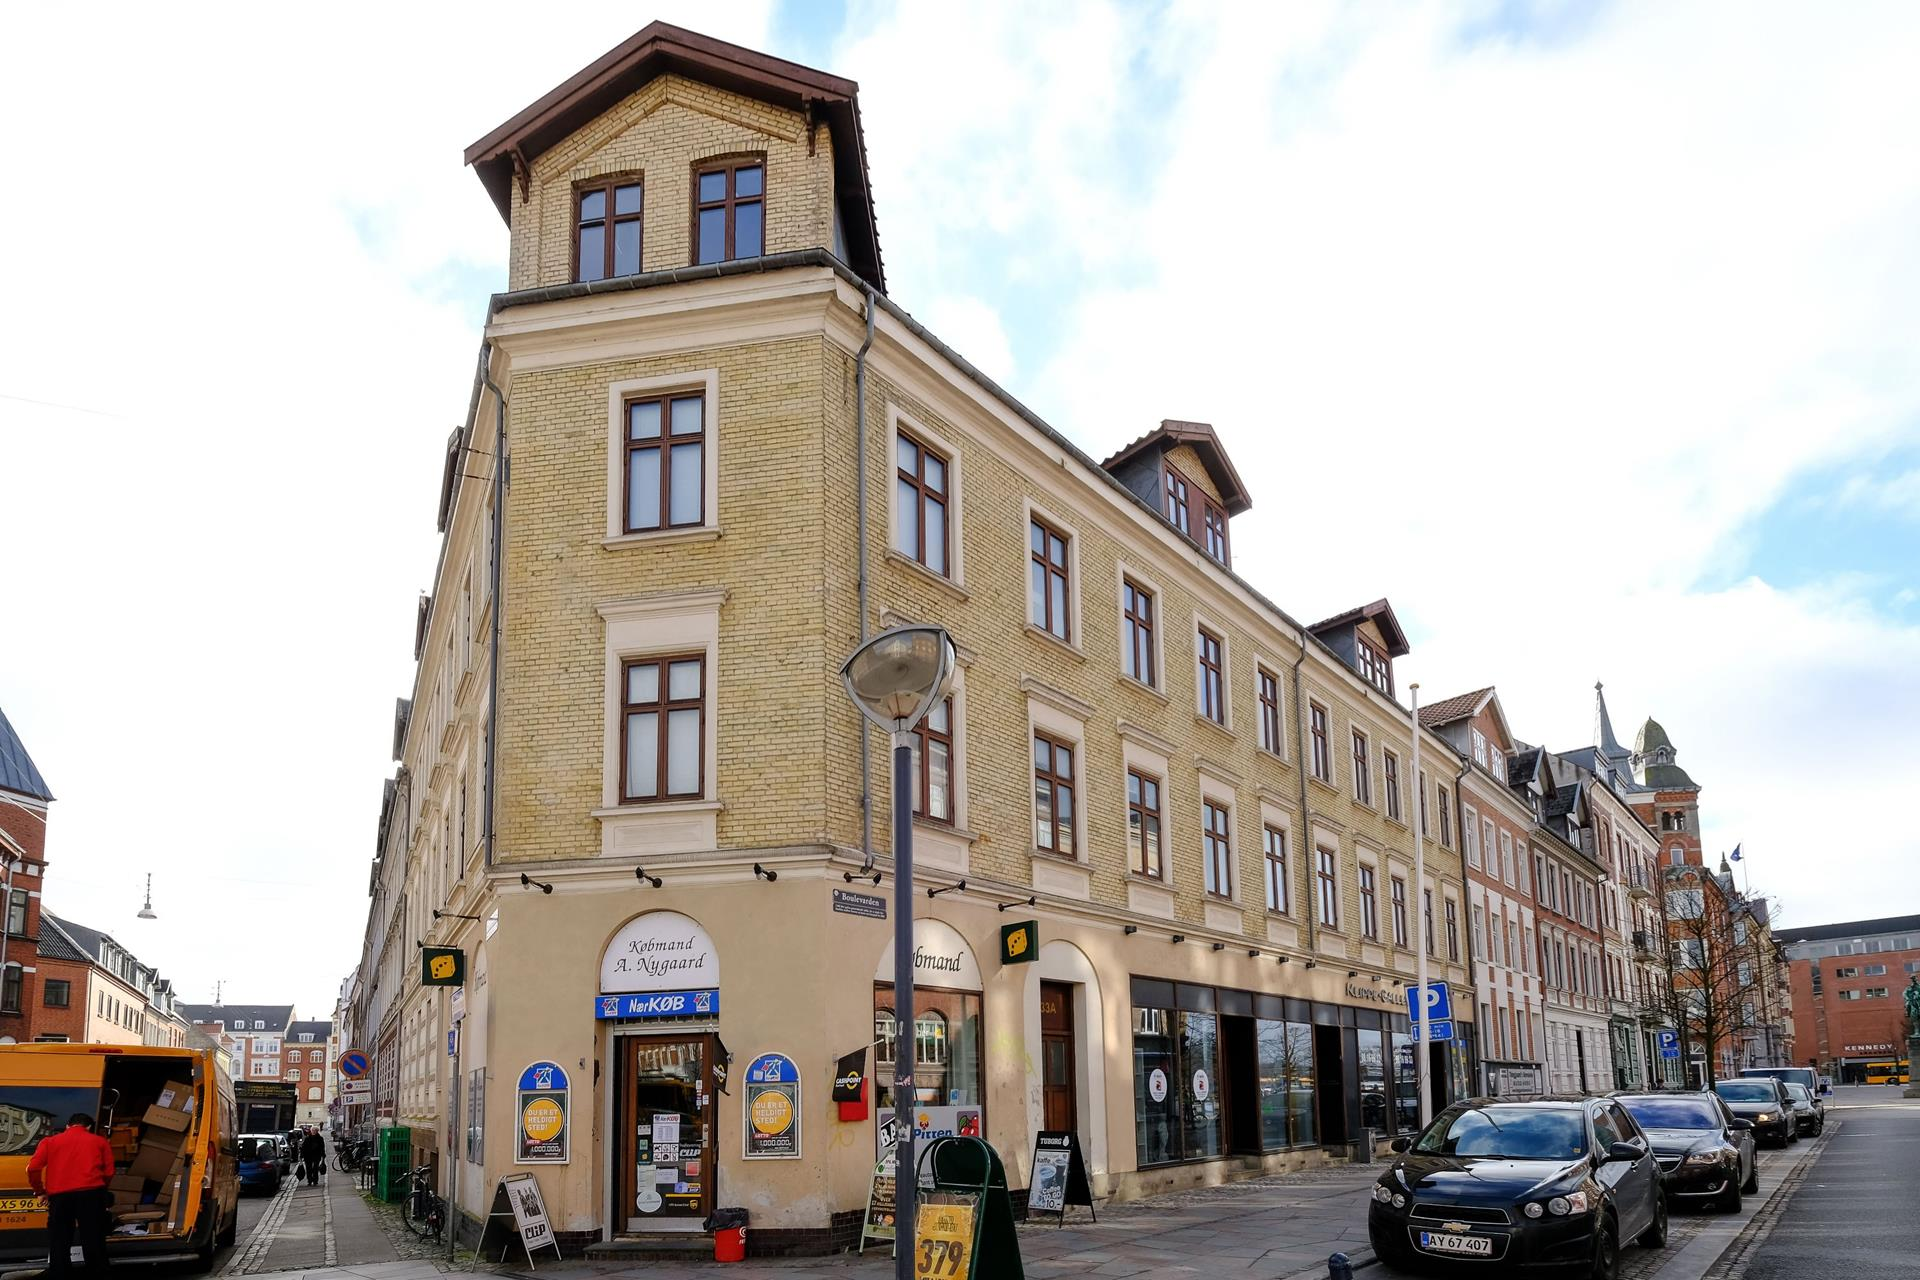 Bolig/erhverv på Boulevarden i Aalborg - Ejendommen